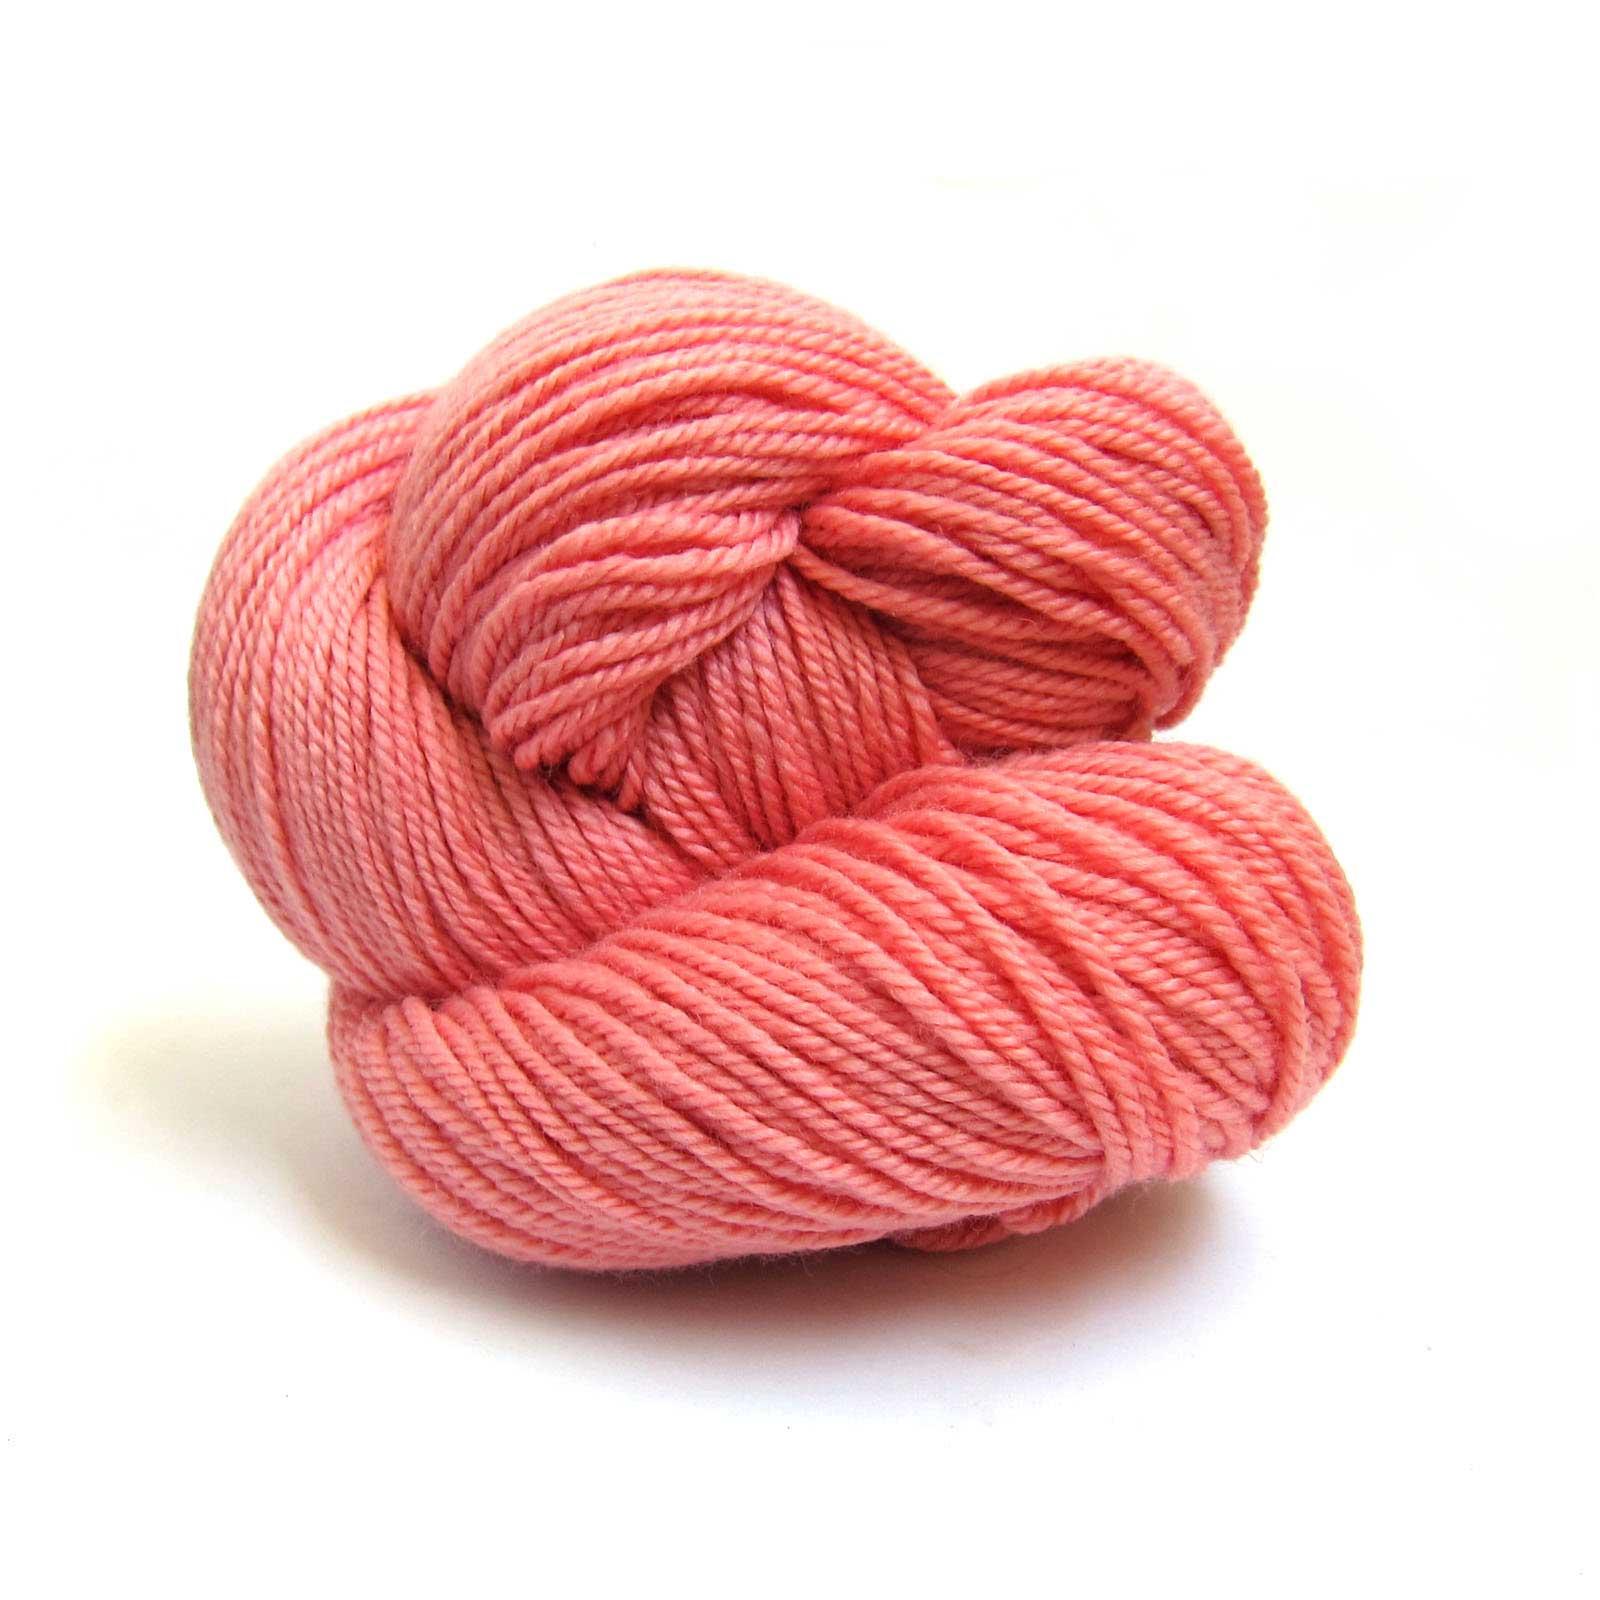 Blush Louet Gems 100% Merino Superwash Yarn